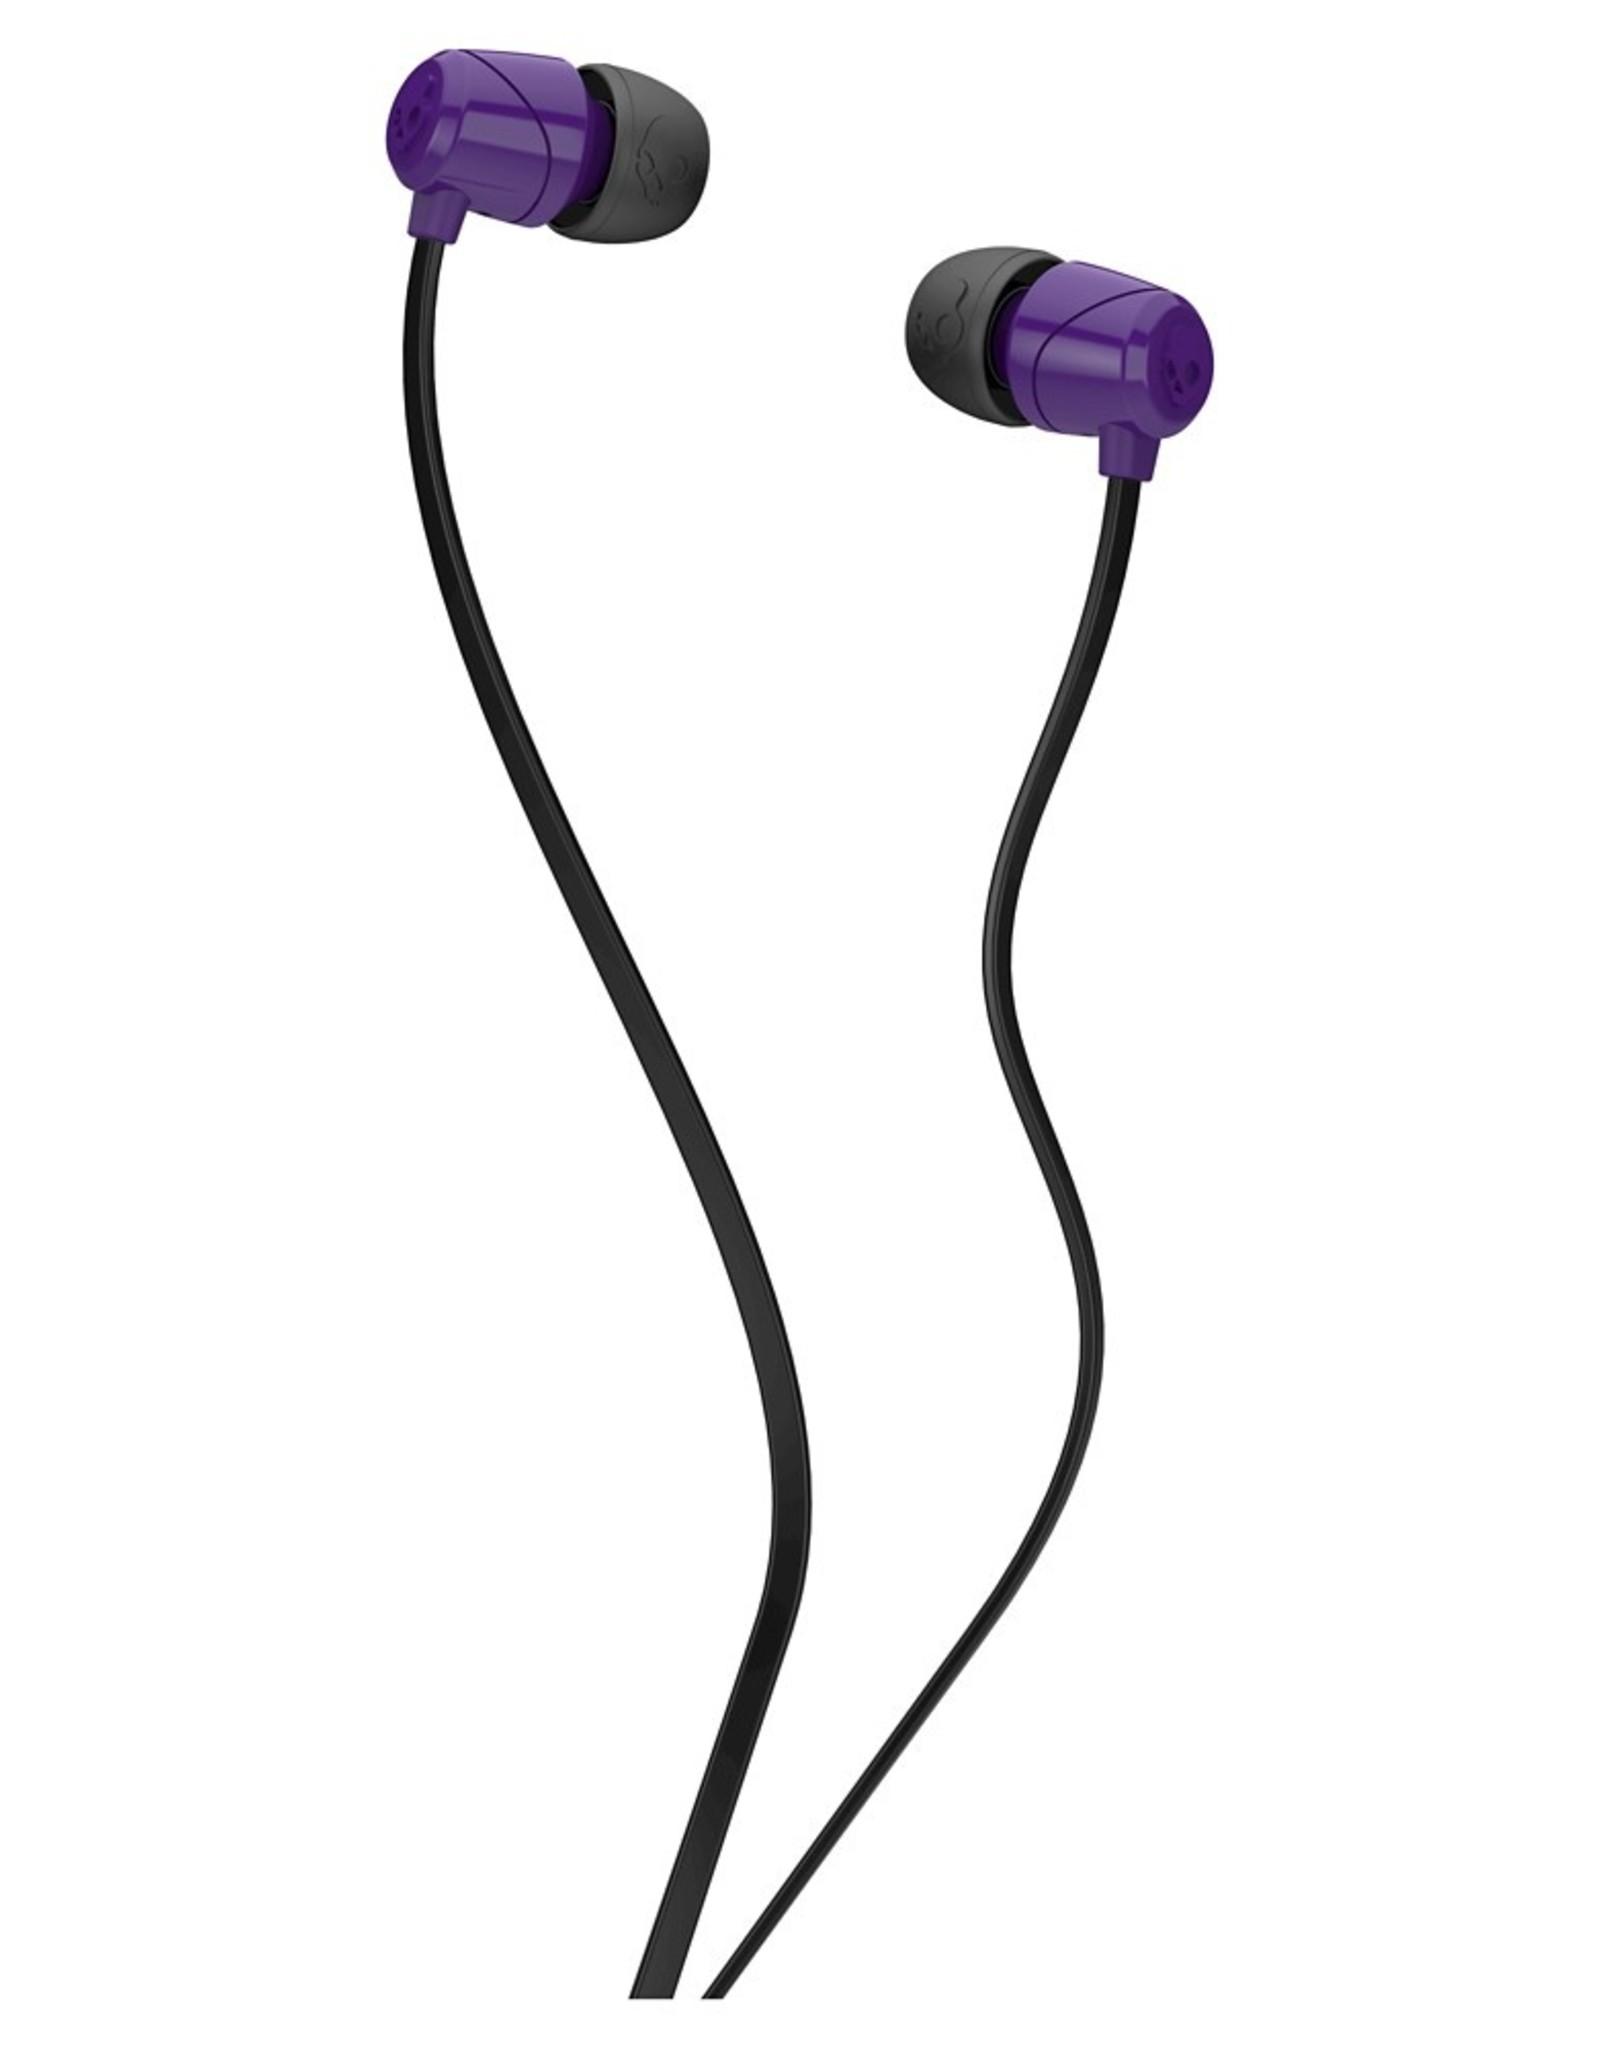 Skullcandy | Earphone - Stereo - Purple, Black S2DUDZ-042